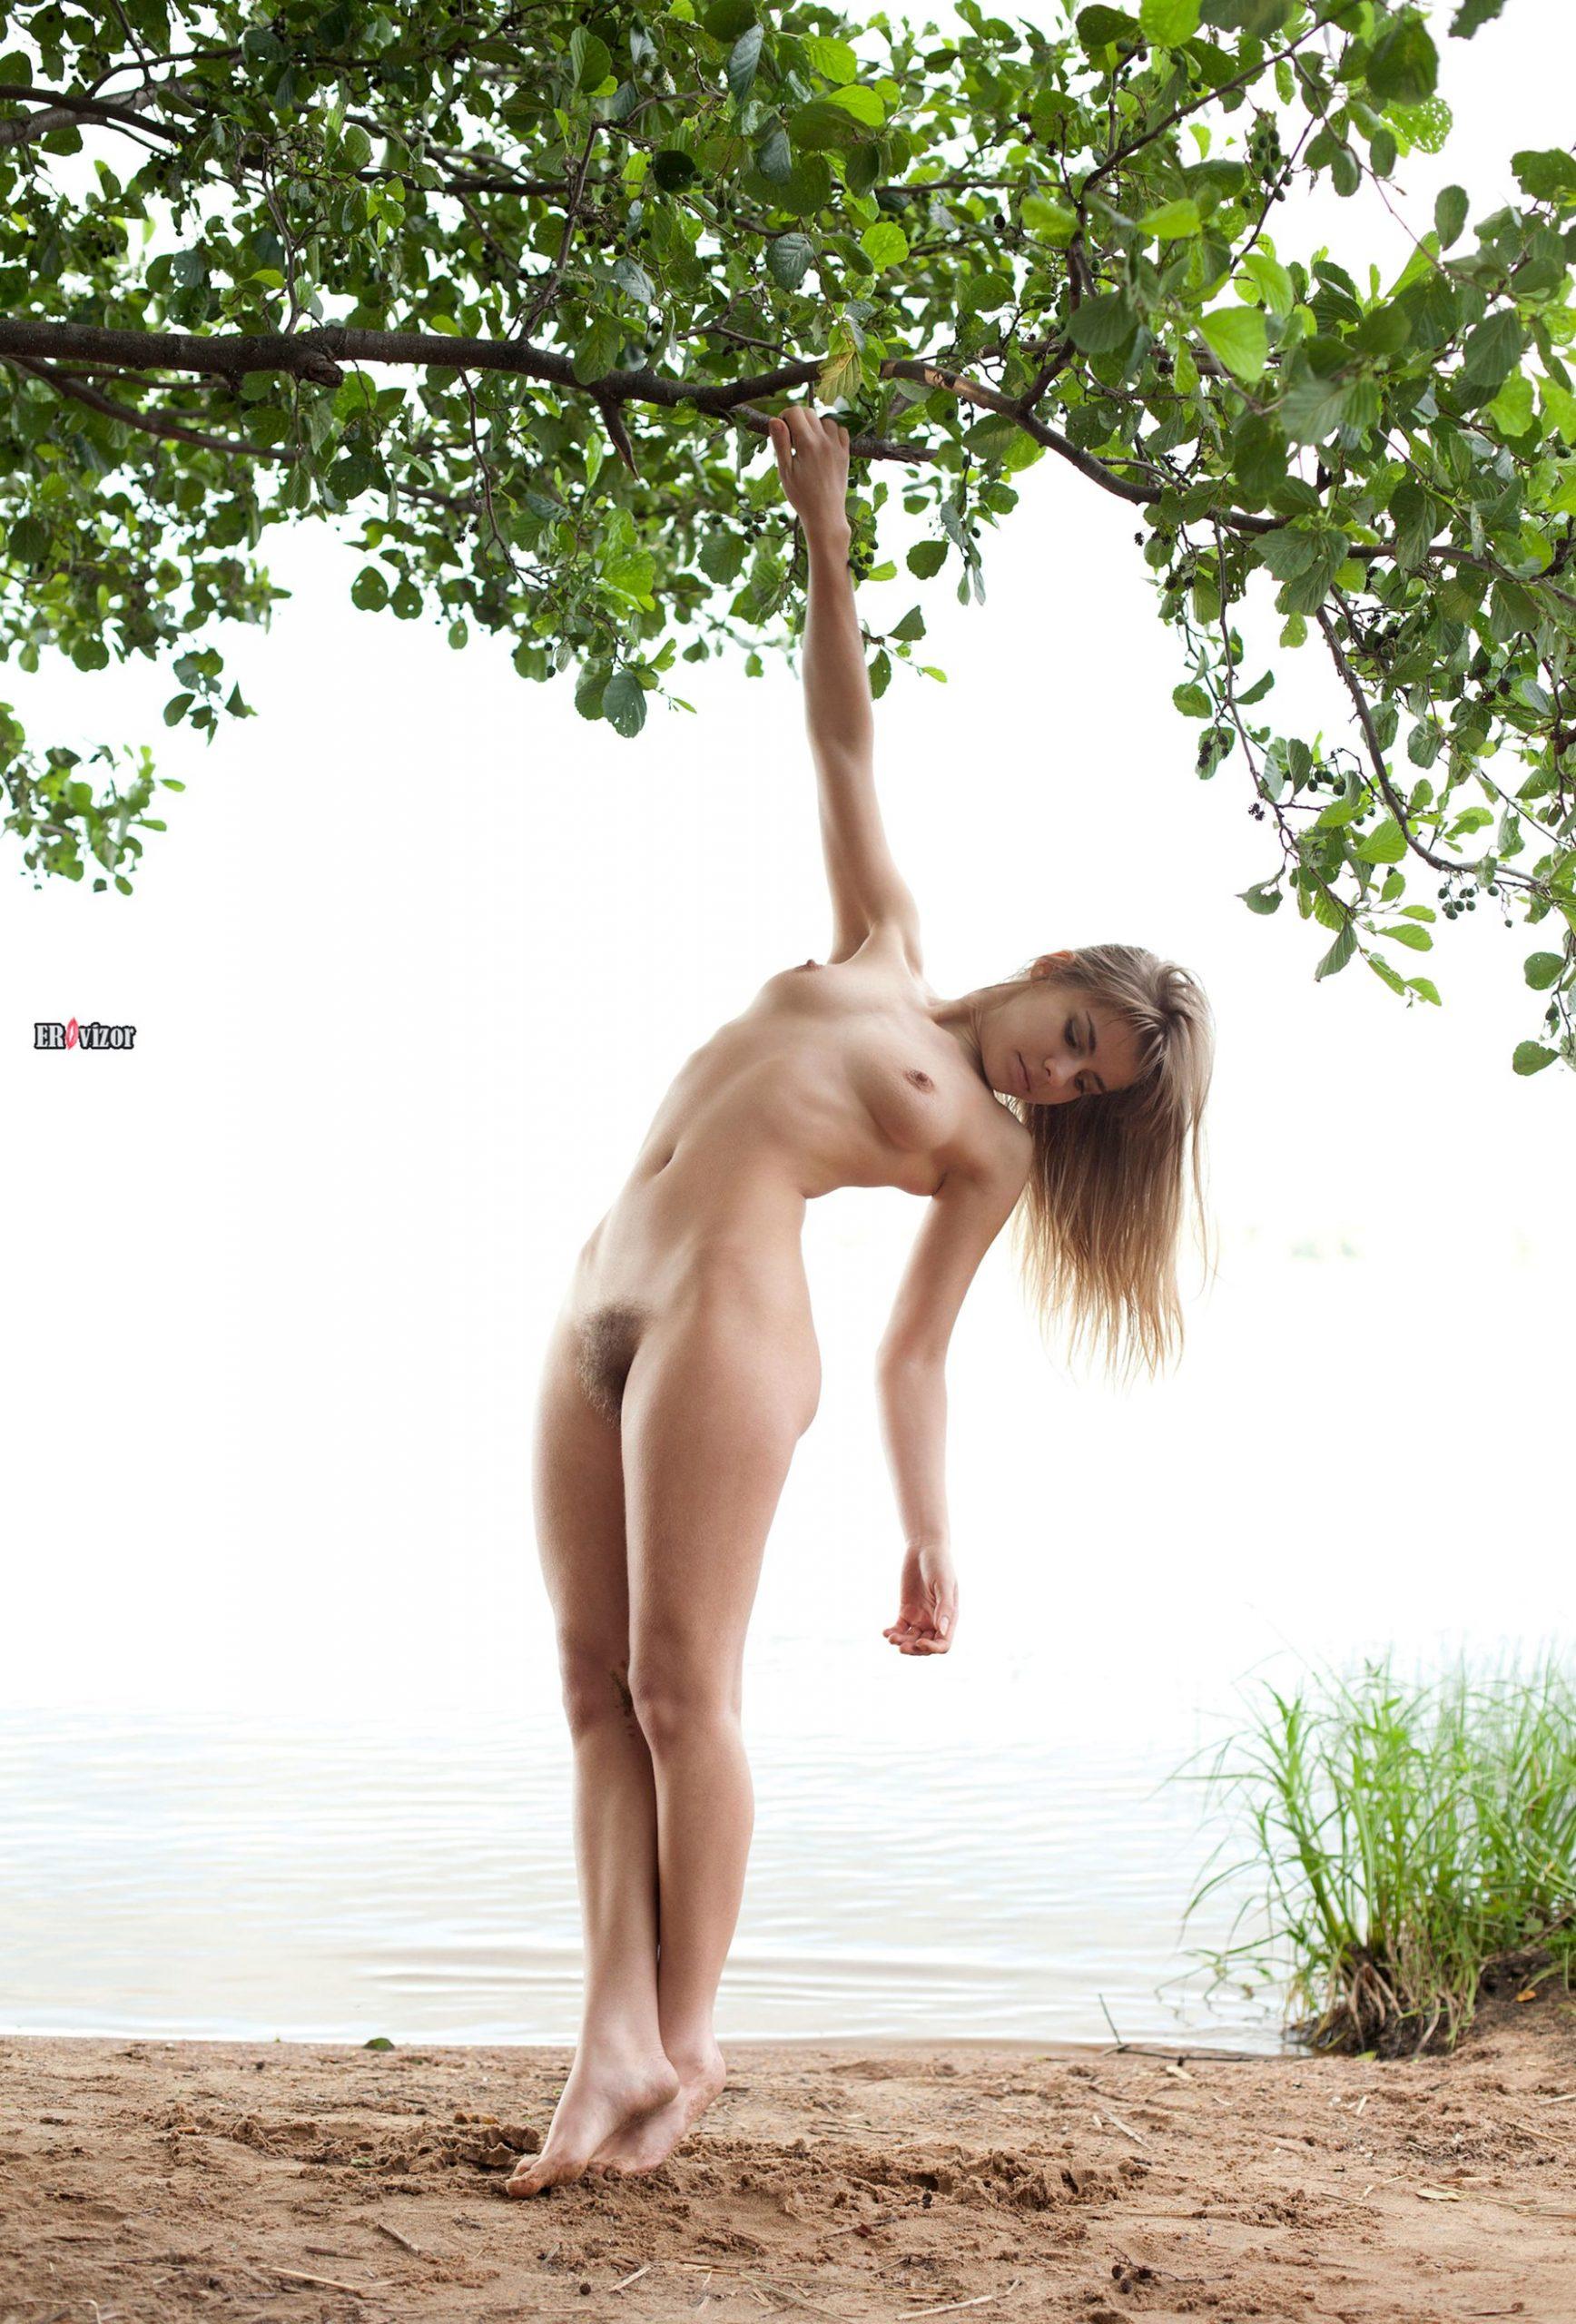 adele_naked_acrobatic-erovizor-11